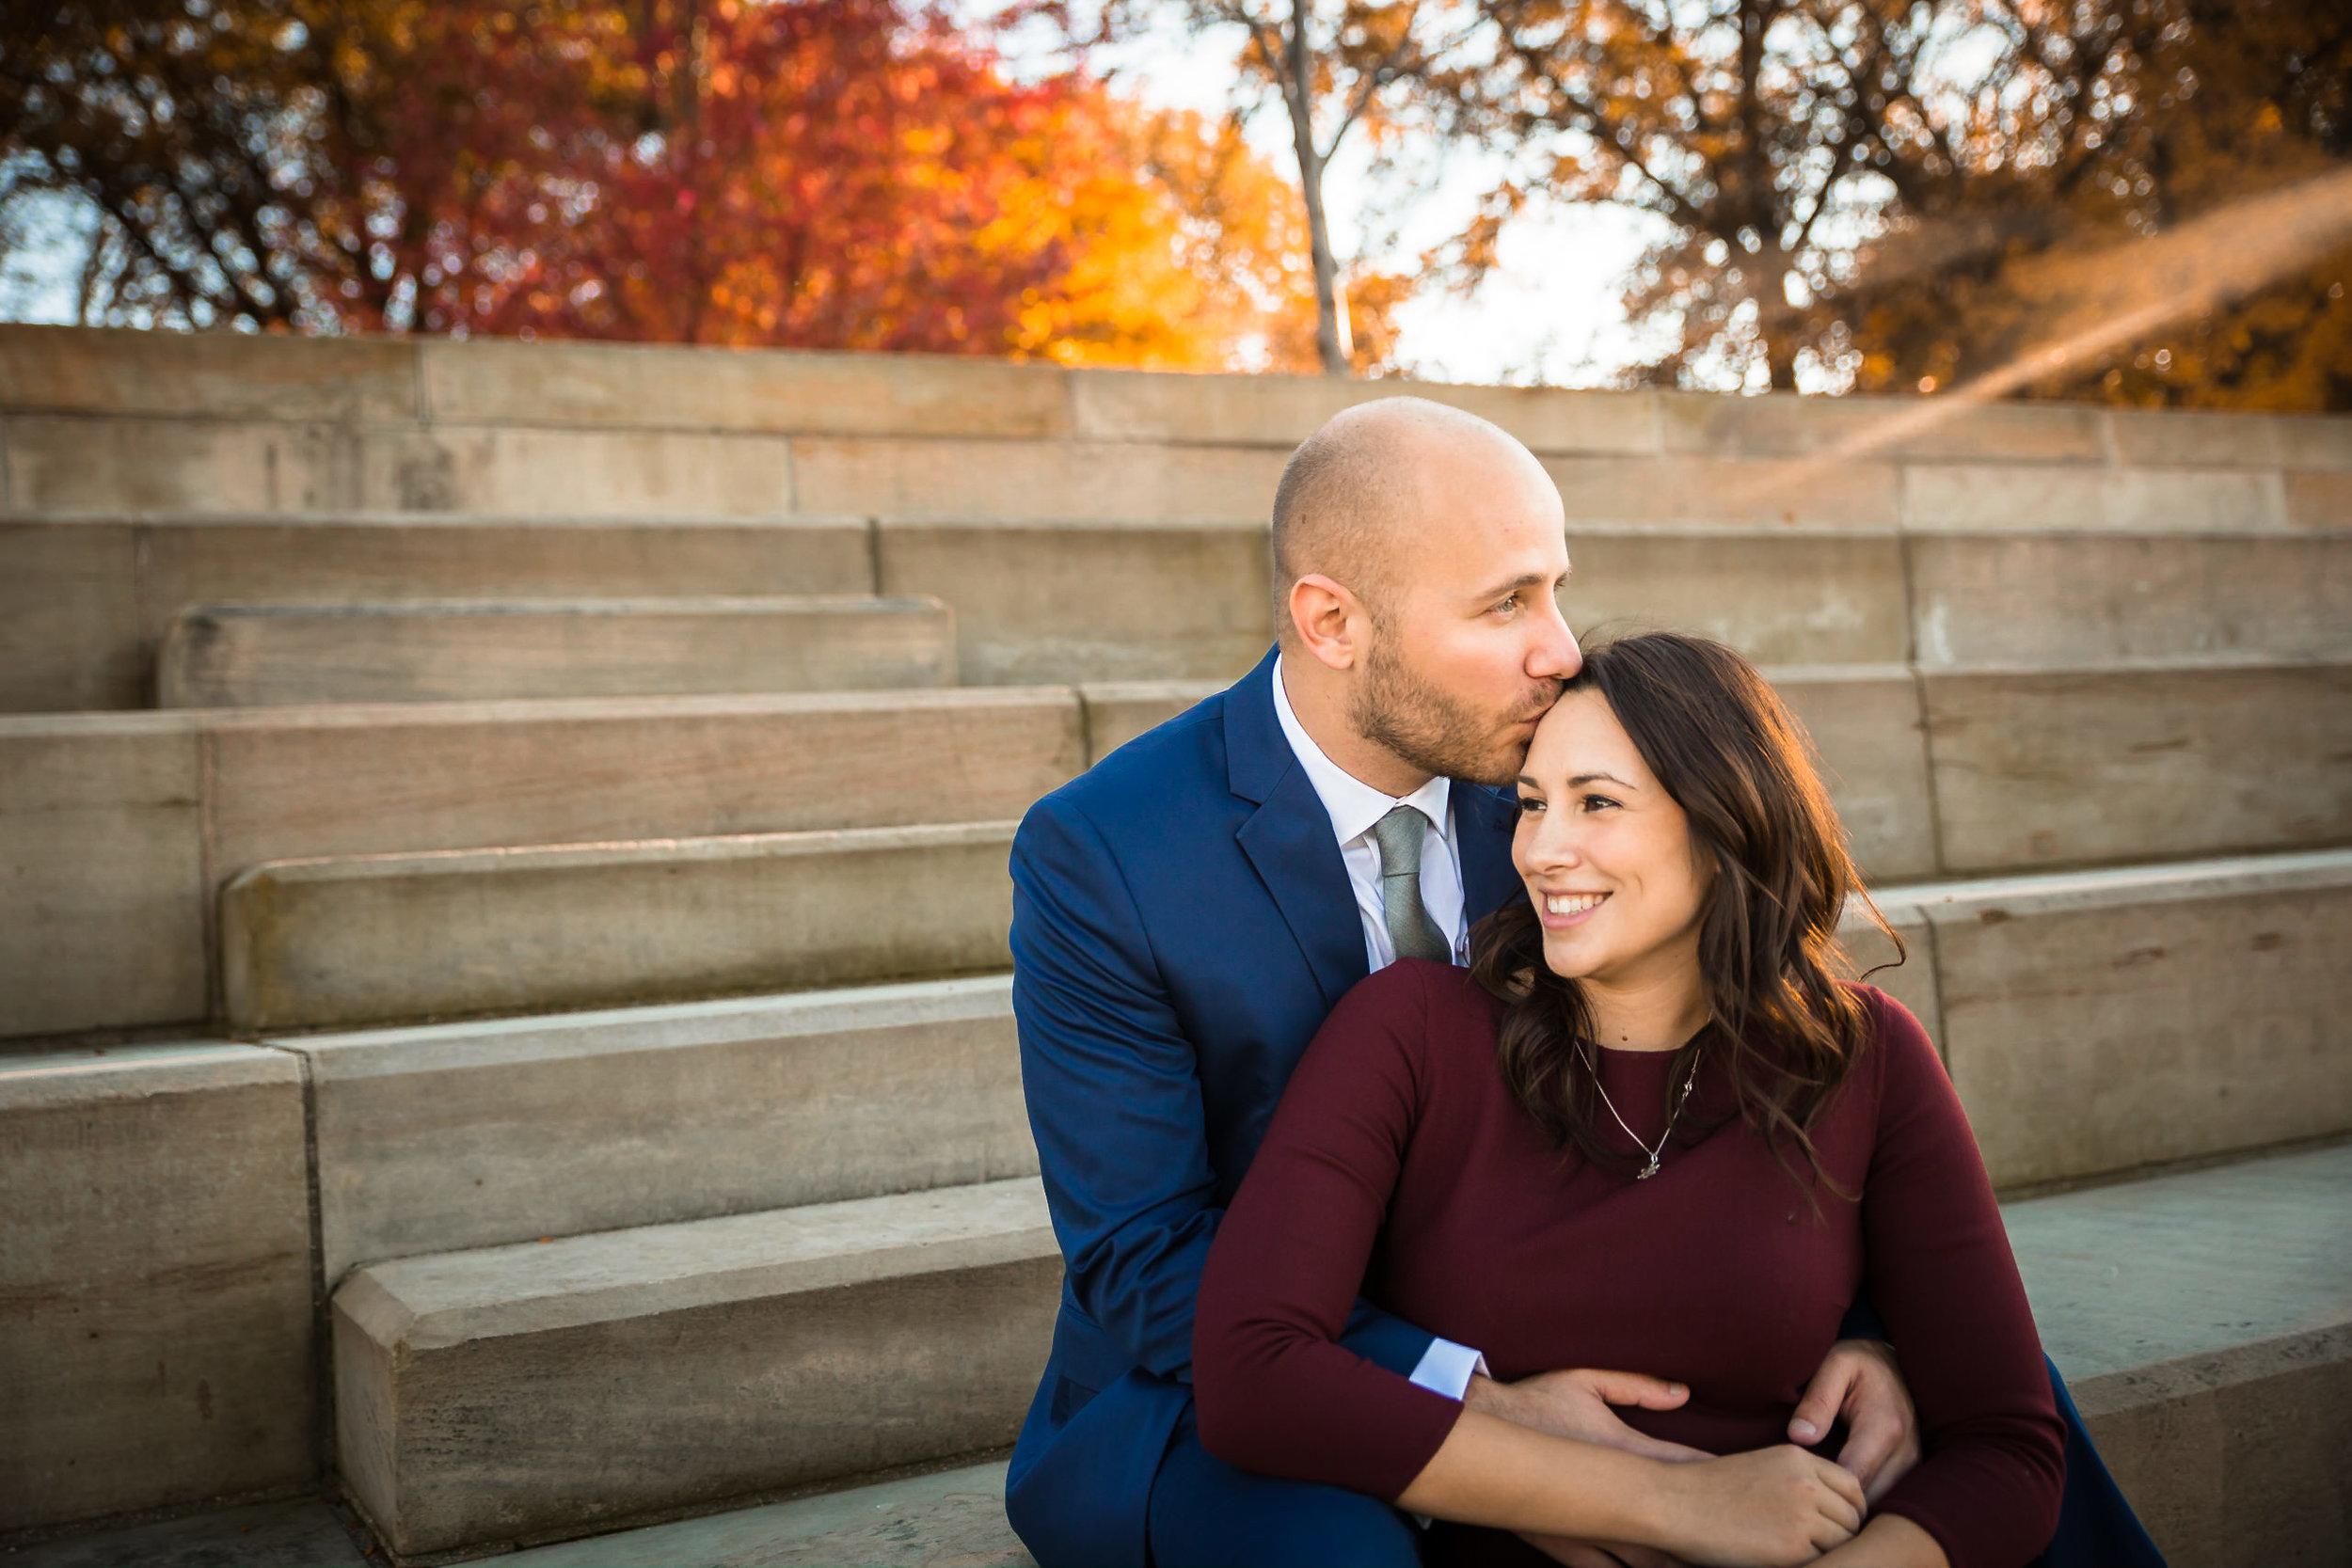 Engagement Wedding Shoot Locations Information